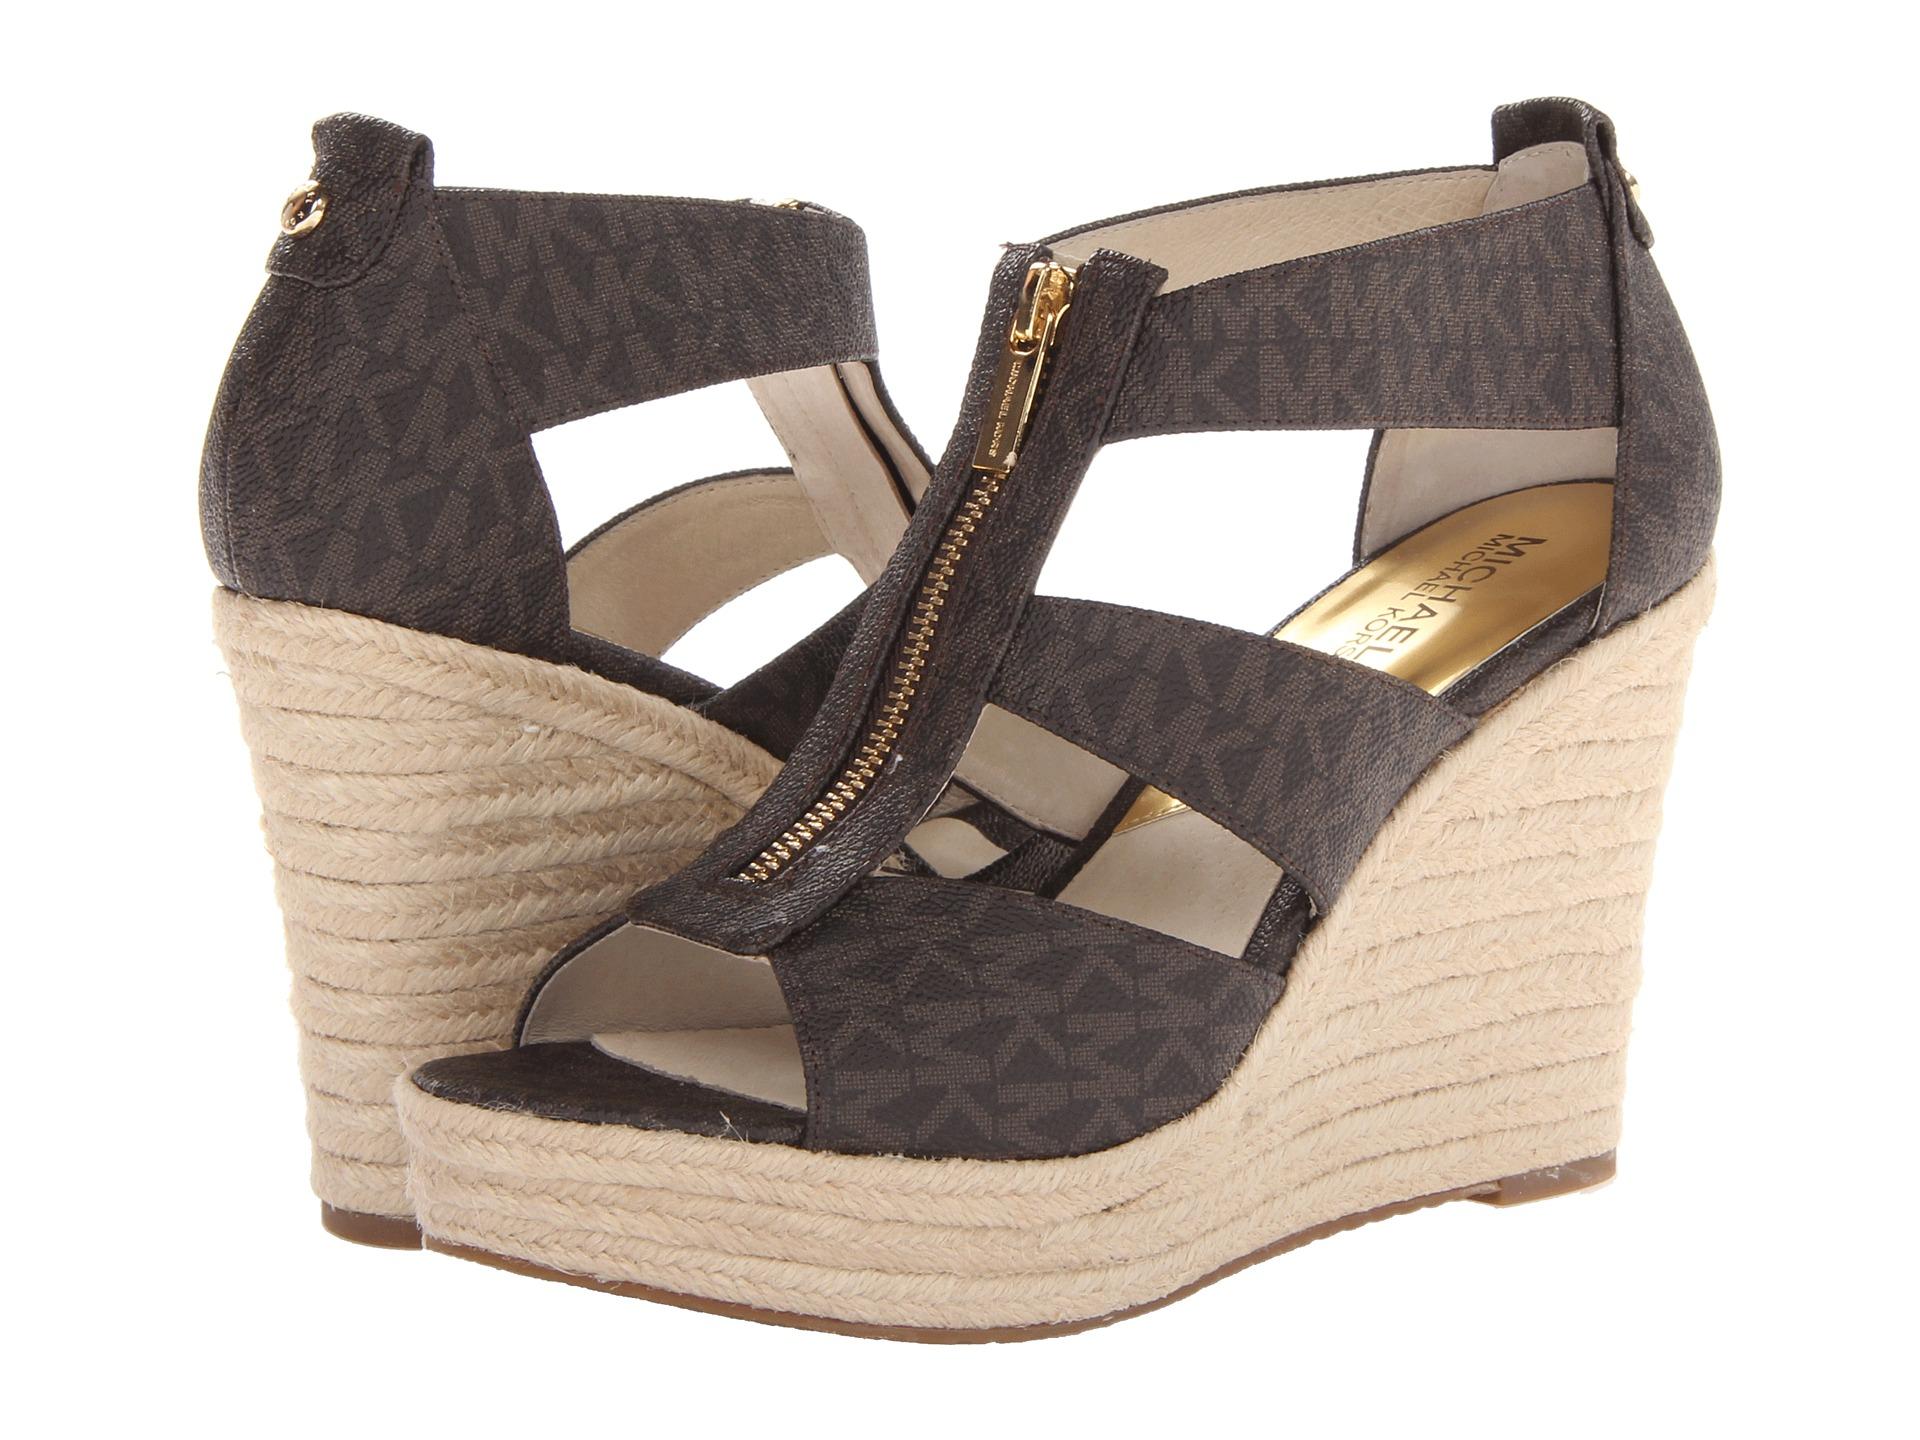 zappos canvas wedges ladies wedge sandals